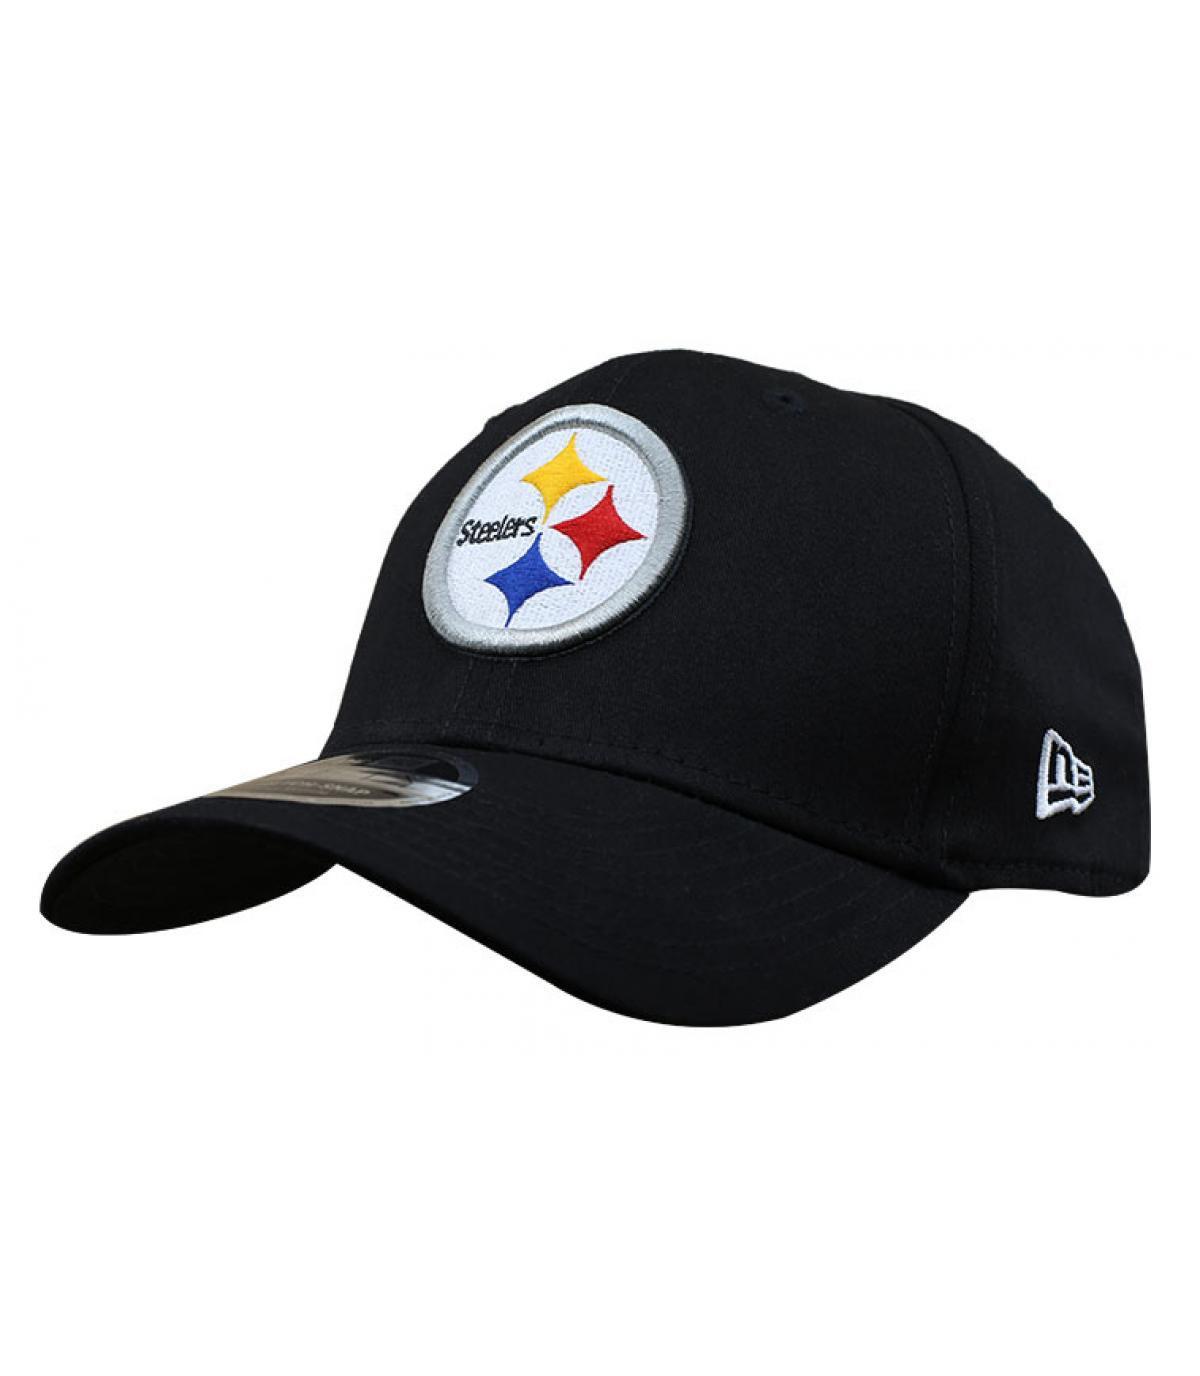 Details Team Stretch Steelers 950 - afbeeling 2